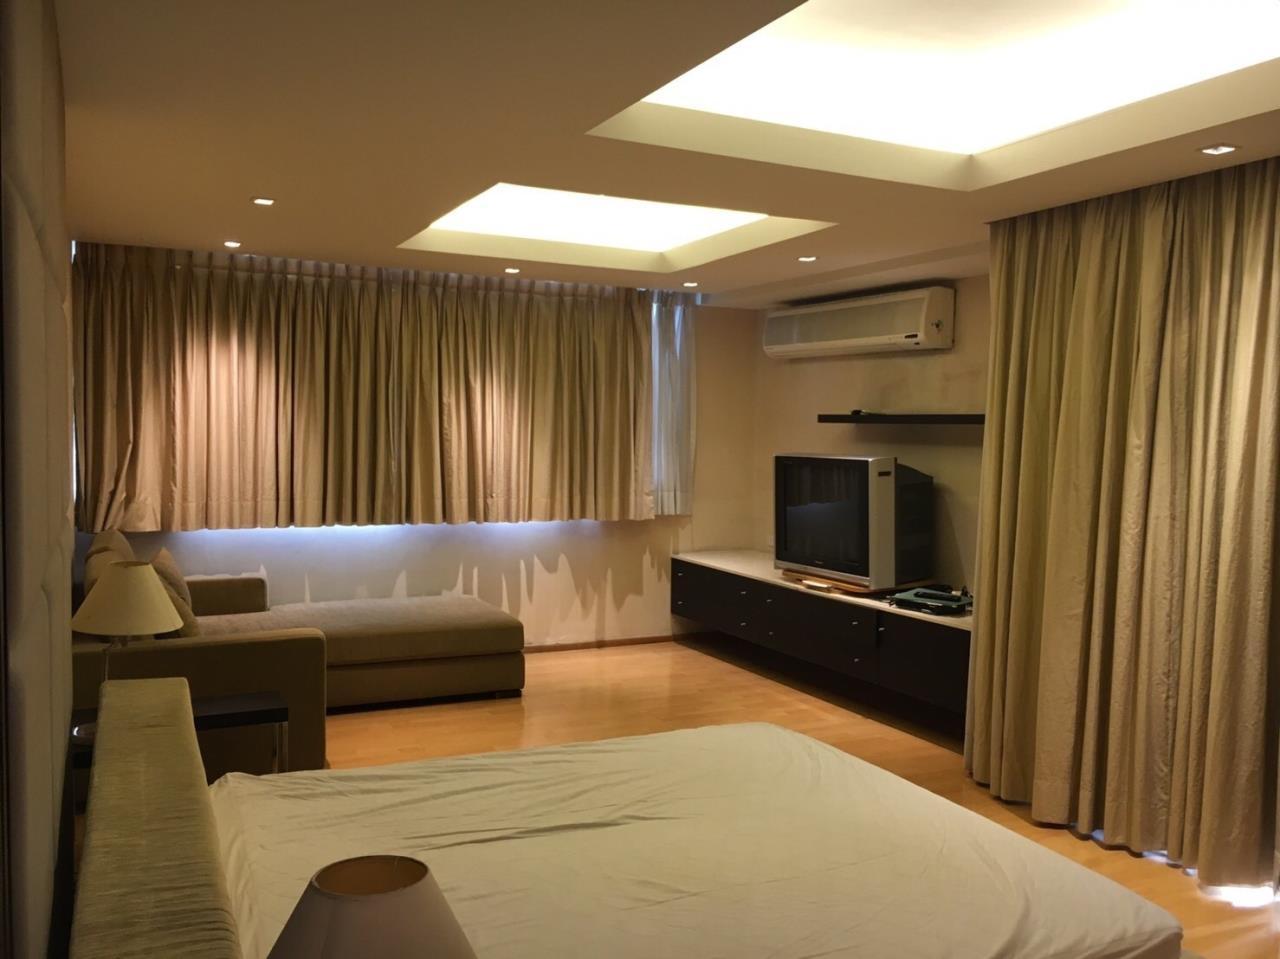 Piri Property Agency's Duplex Penthouse with 4 Bedrooms in Ekkamai - 27th Floor 3